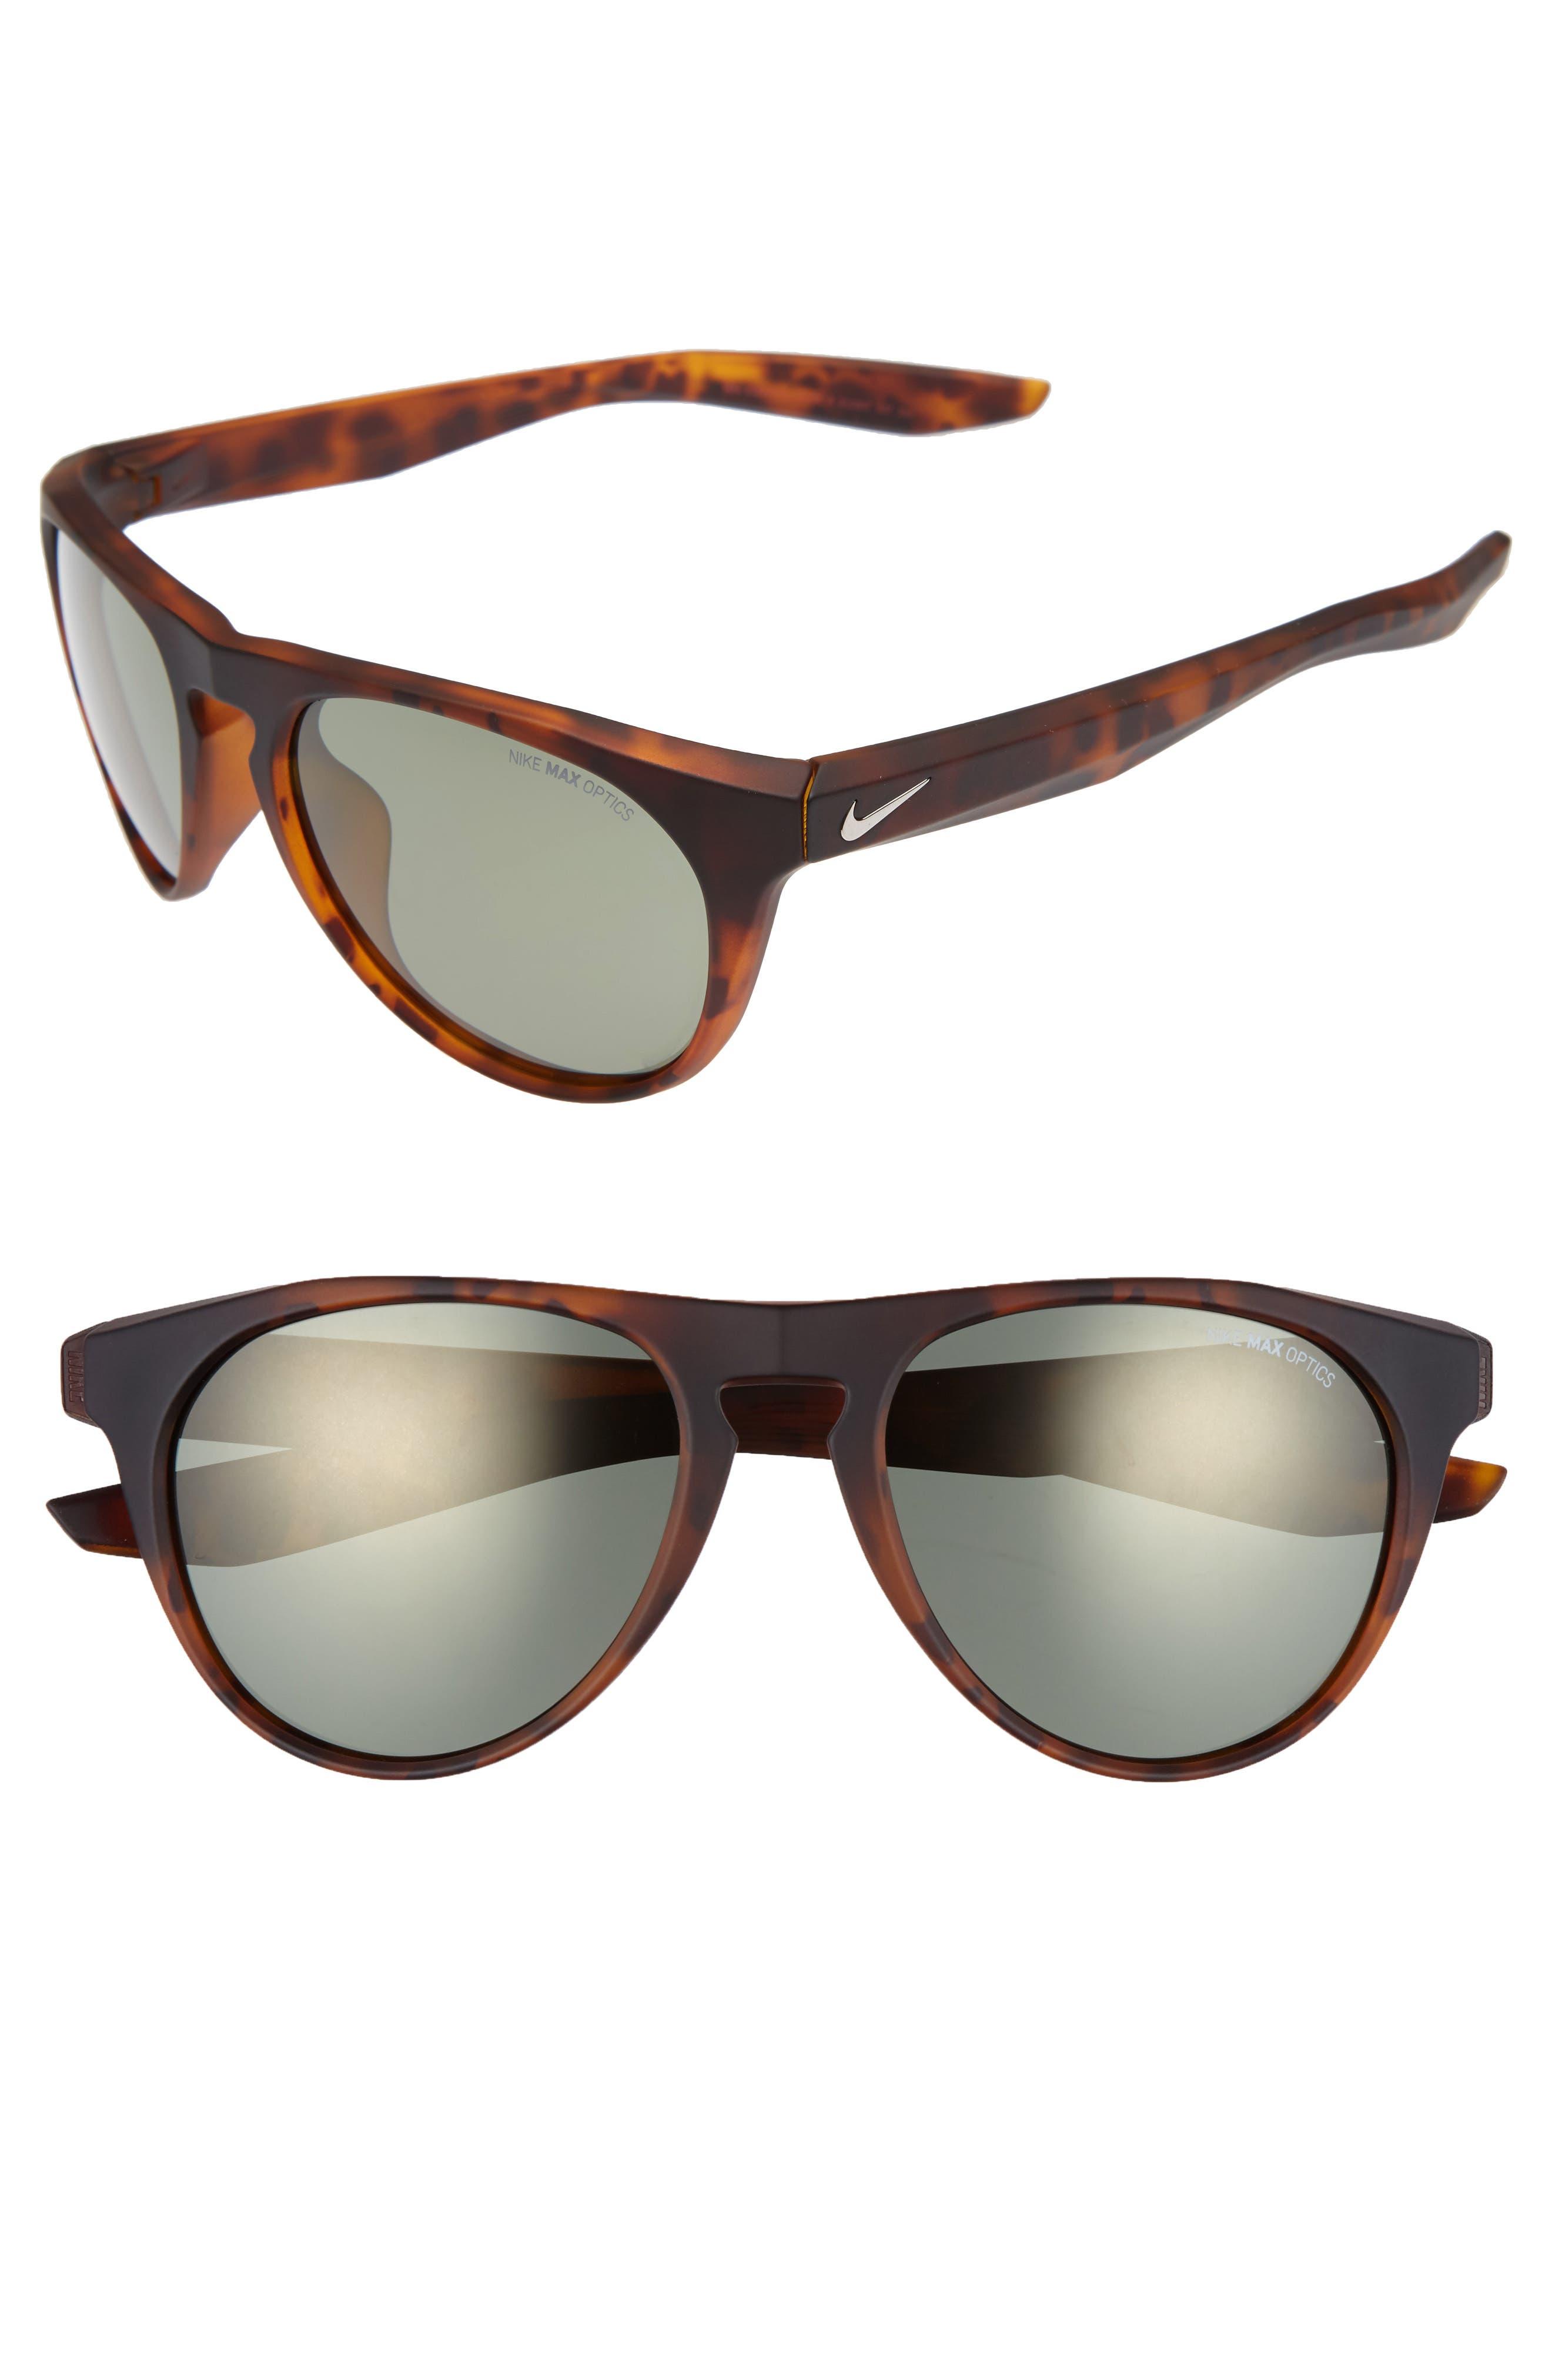 Nike Essential Jaunt R 56mm Sunglasses